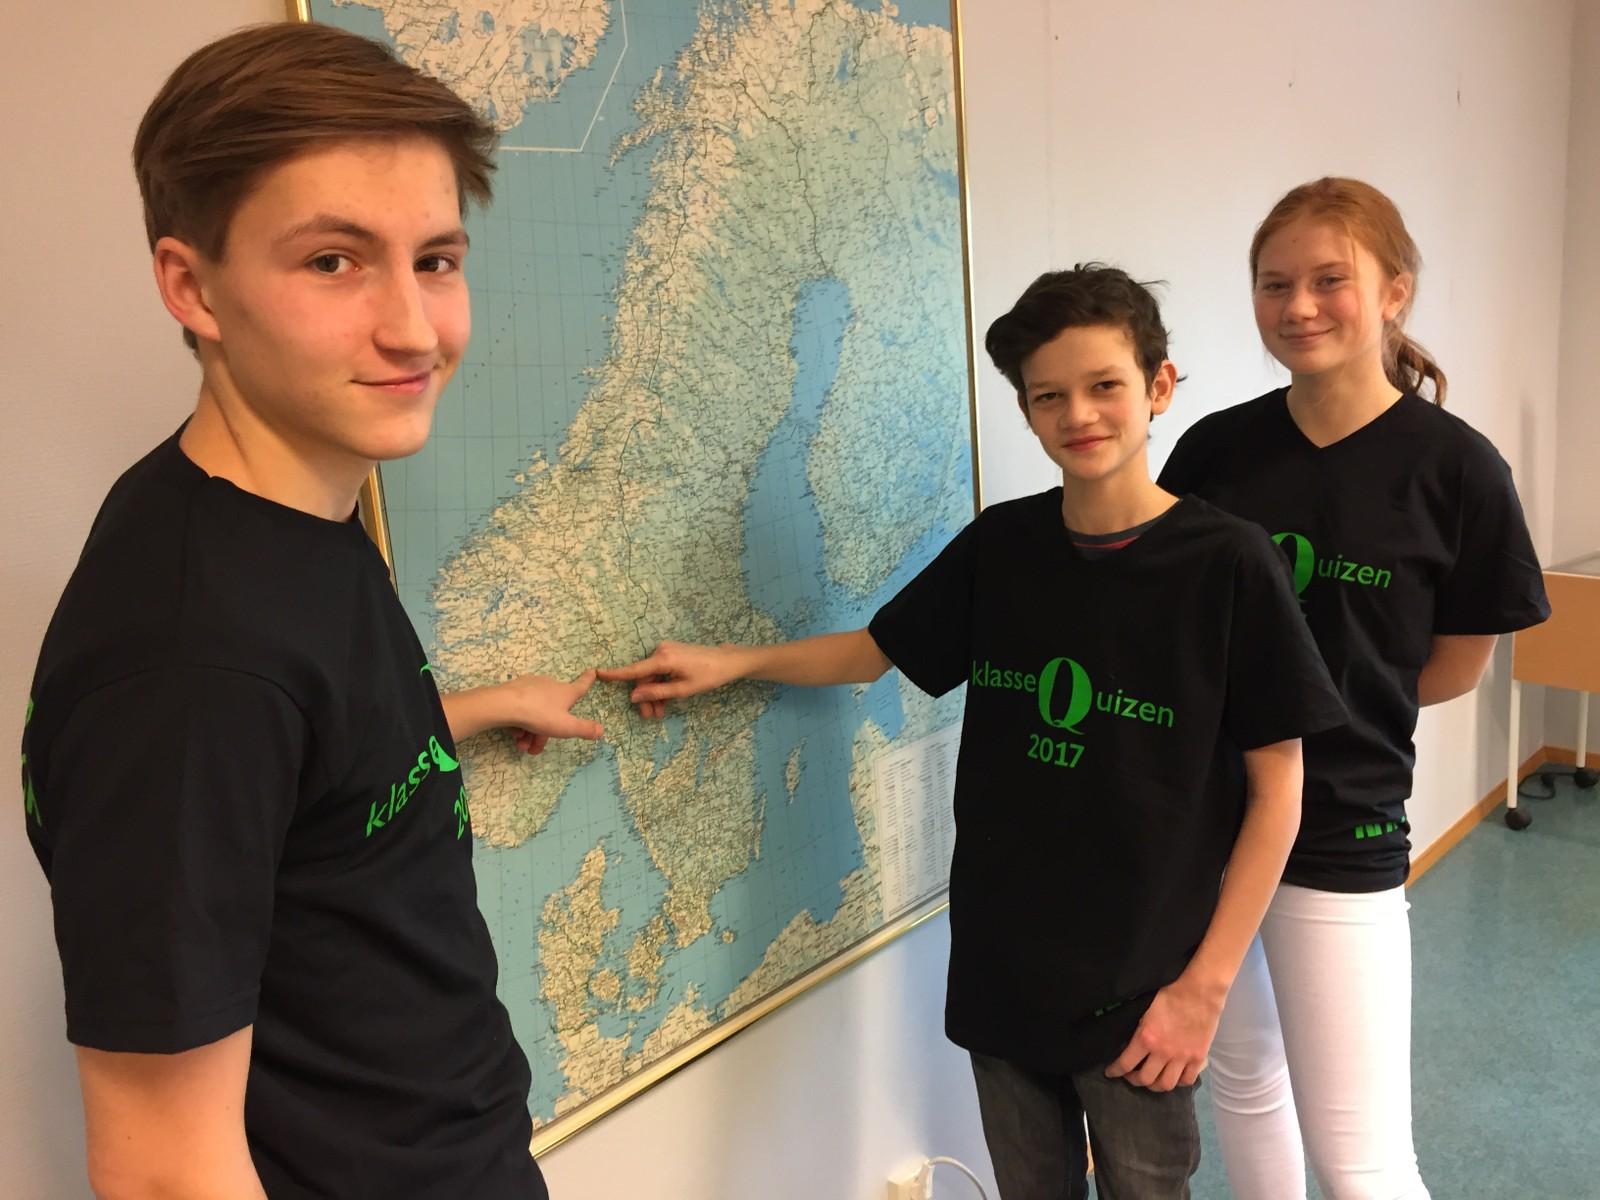 Henrik Ekra Hoff, Ådne Rolstad og Maren Schumann fra Brandbu ungdomsskole fikk 12 poeng.